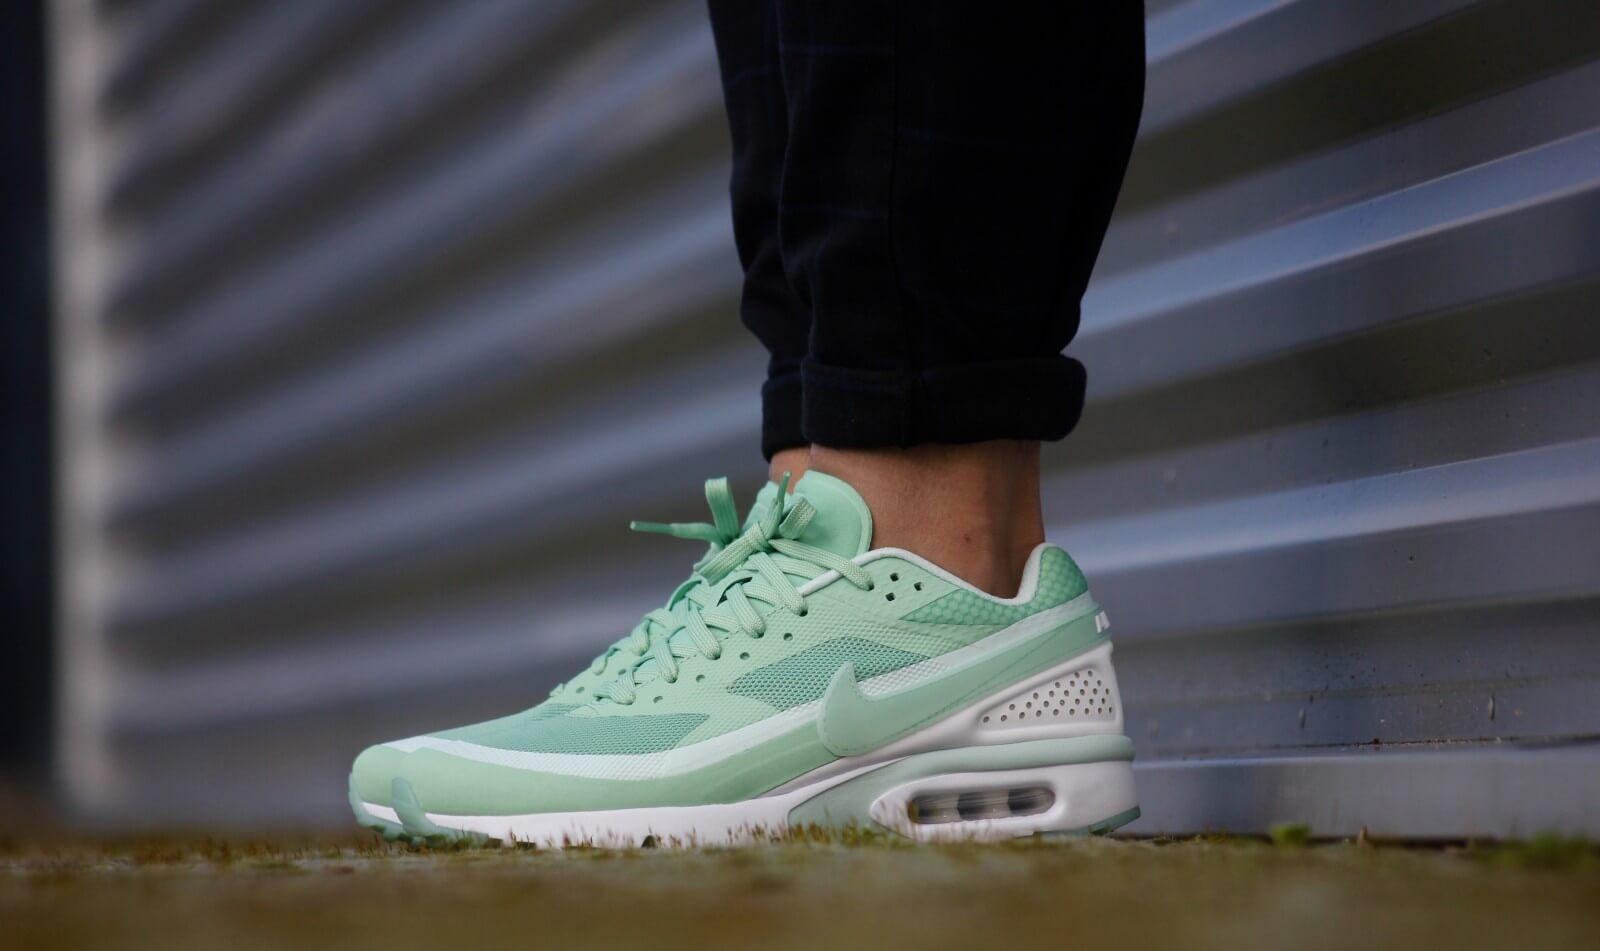 Nike Air Max BW Ultra Enamel Green 819475 301